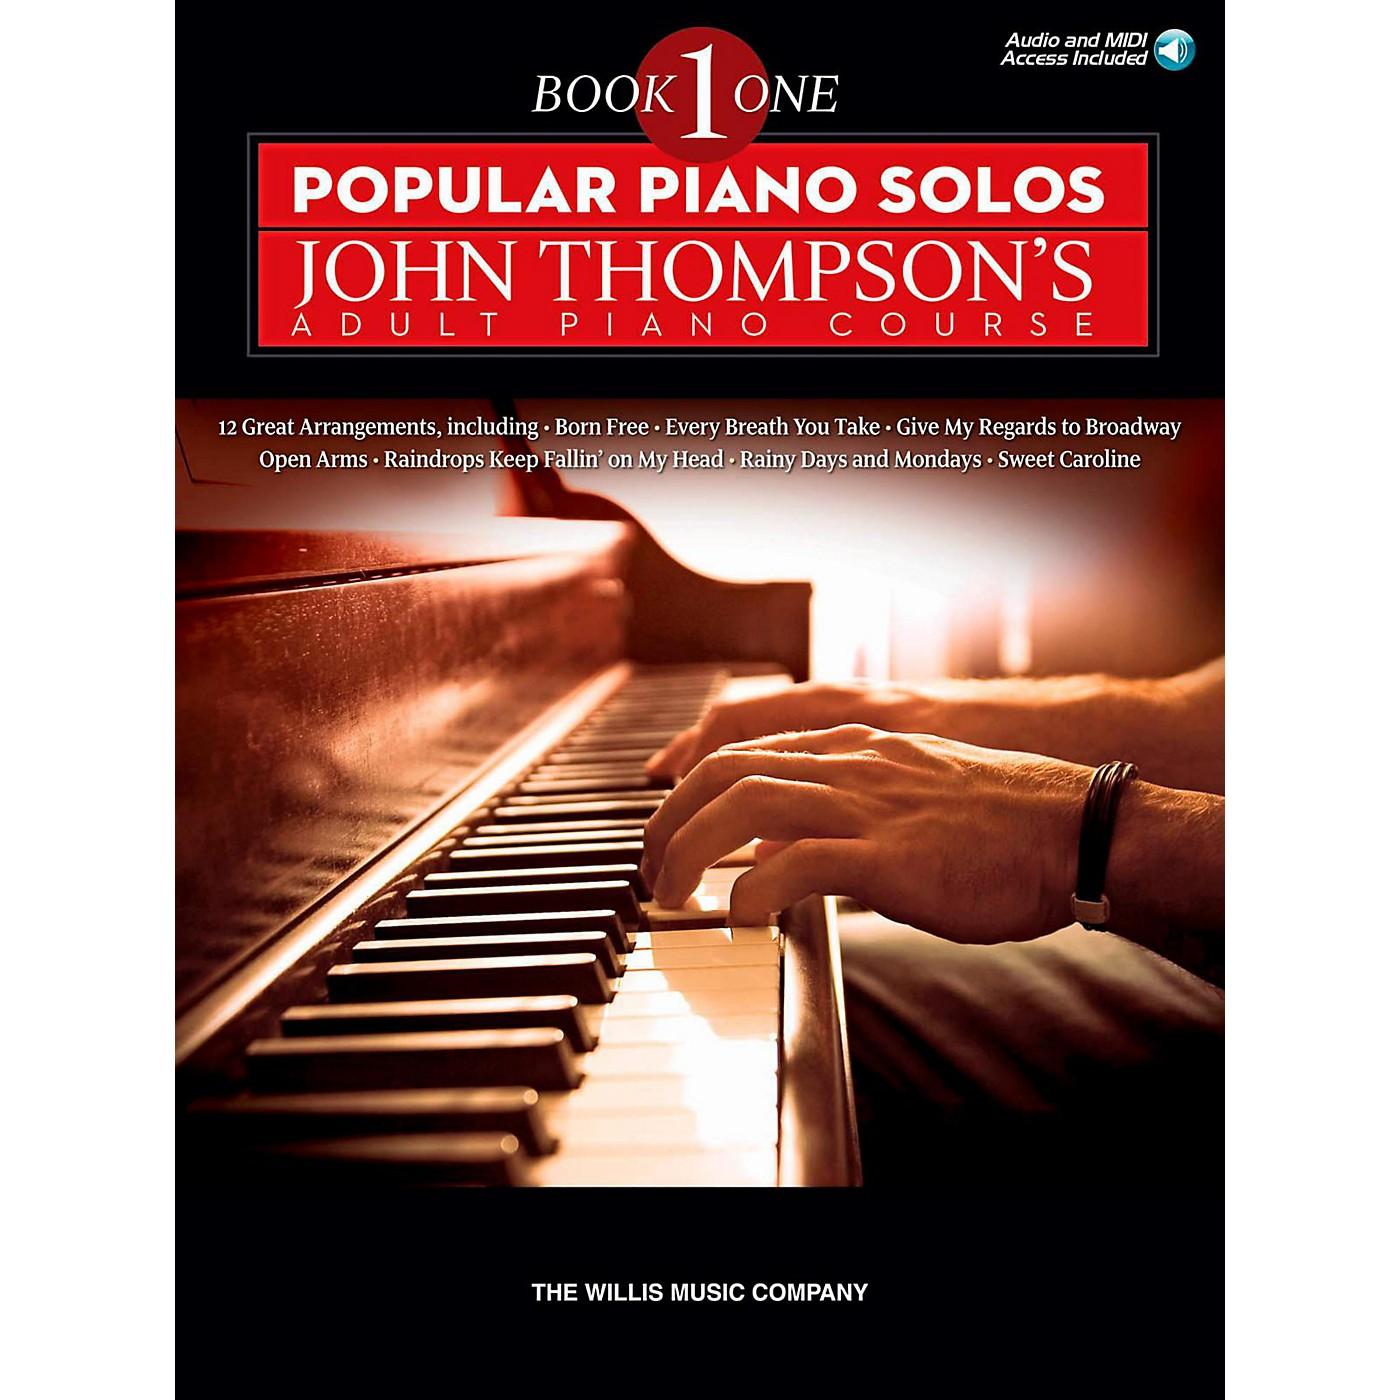 Hal Leonard Popular Piano Solos - John Thompson's Adult Piano Course Book 1 Book/Audio Online thumbnail